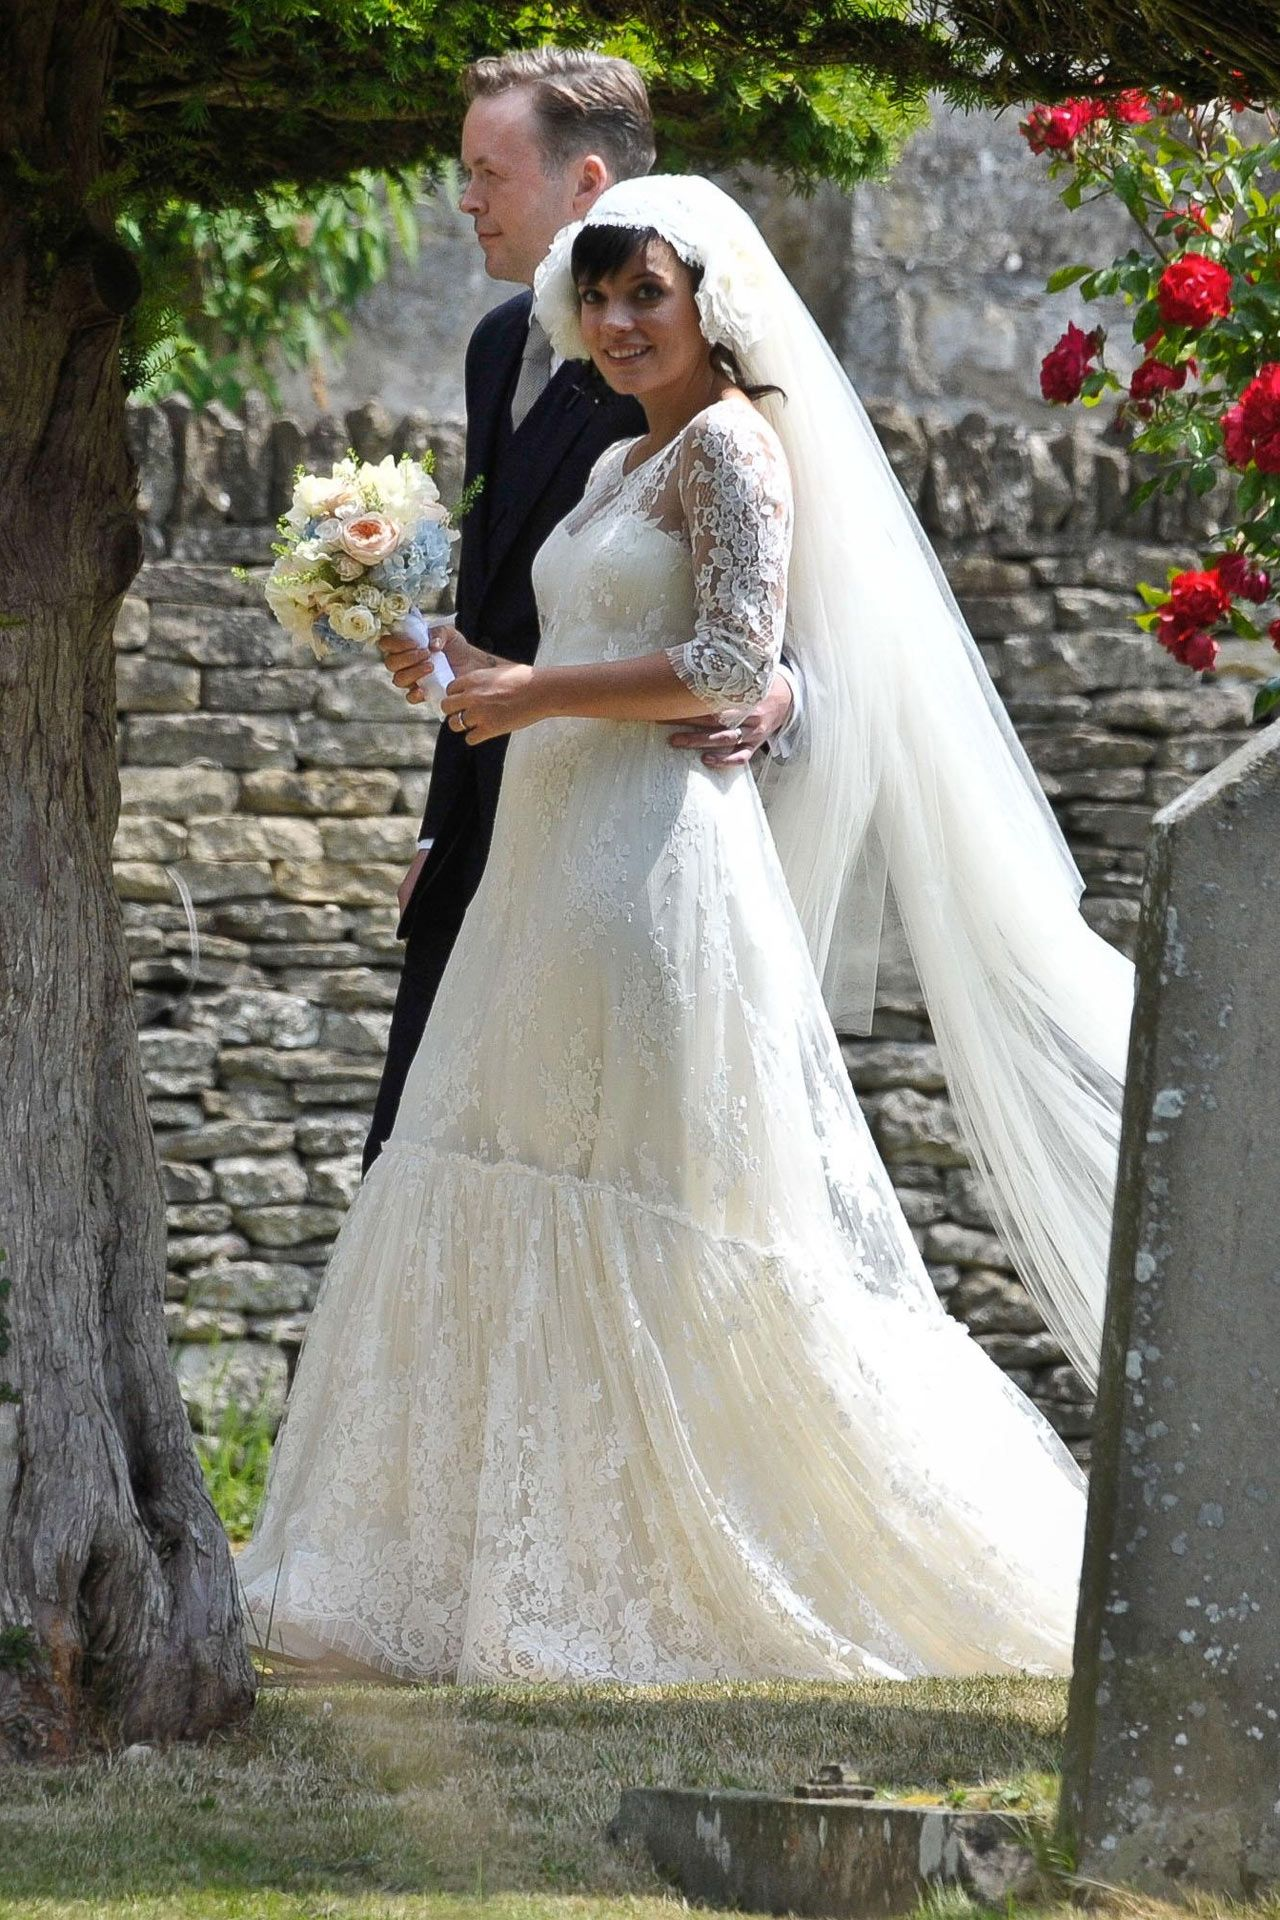 It's OK...Lily Allen has found her Chanel wedding dress